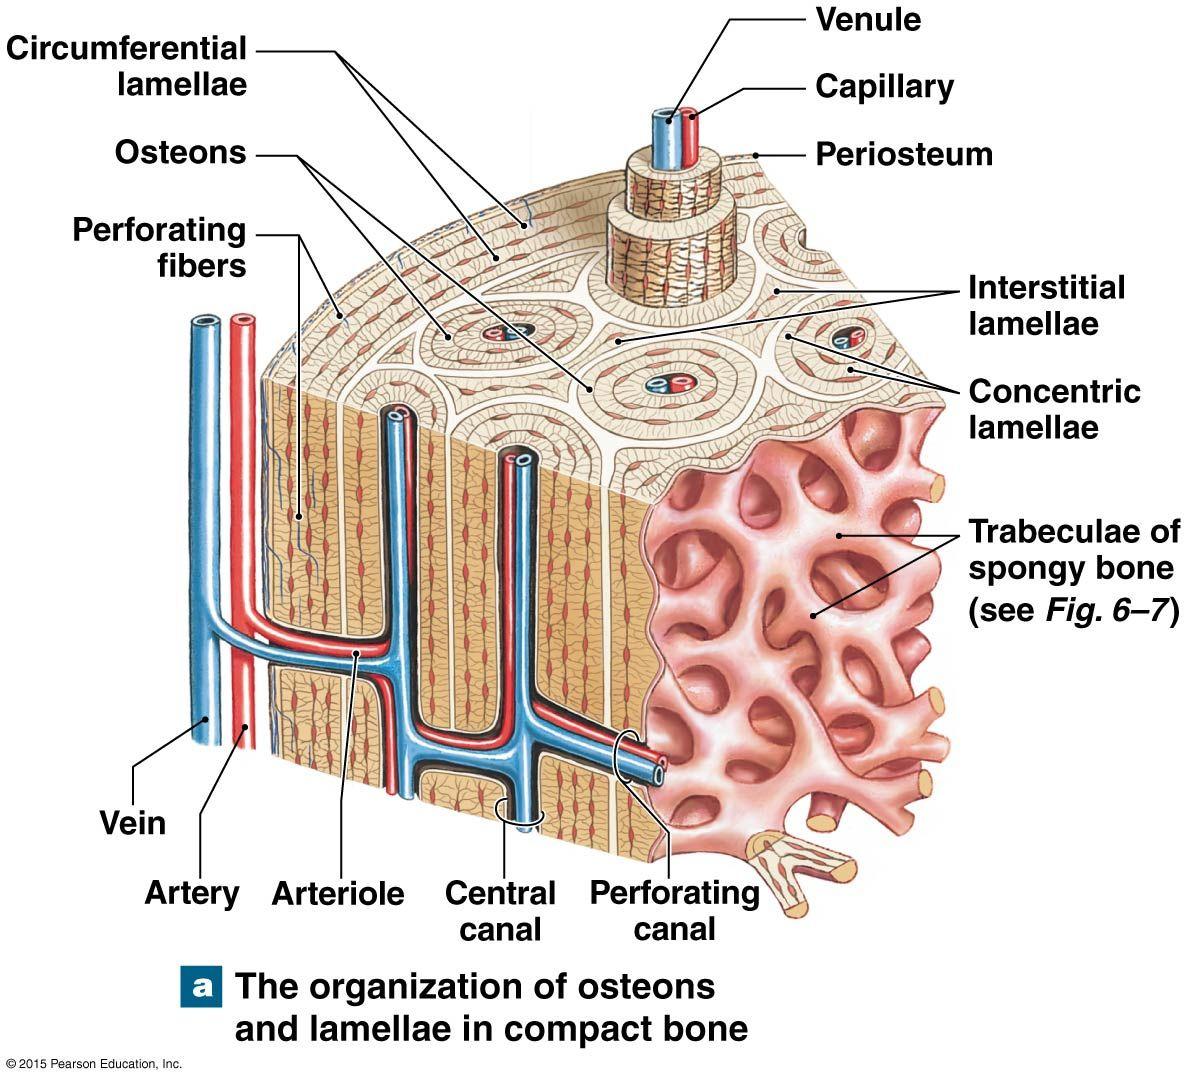 Spongy Bone Containg Red Bone Marrow Anatomy Bones Human Bones Anatomy Human Anatomy And Physiology